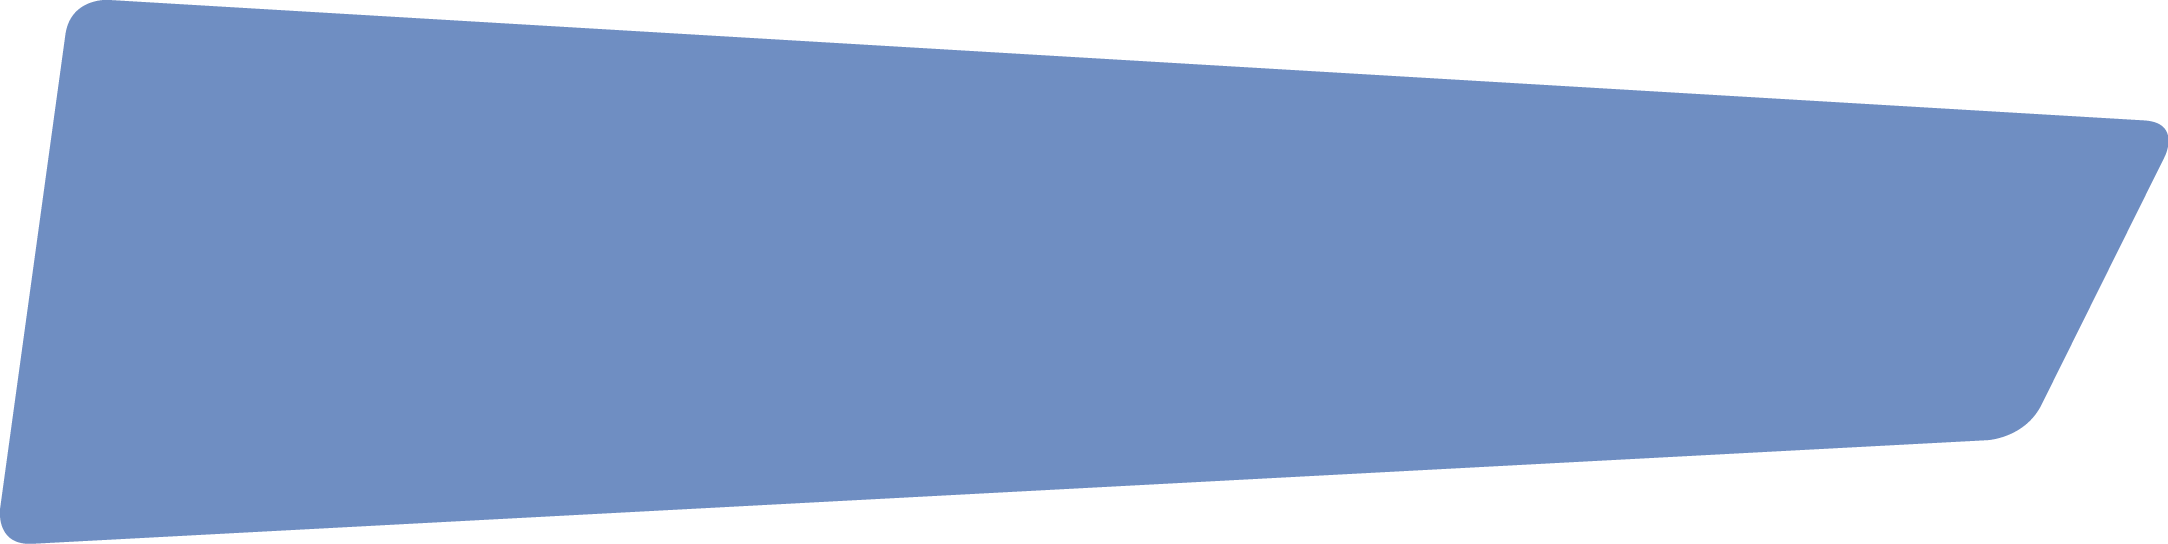 Filename: blue.png - Shape PNG